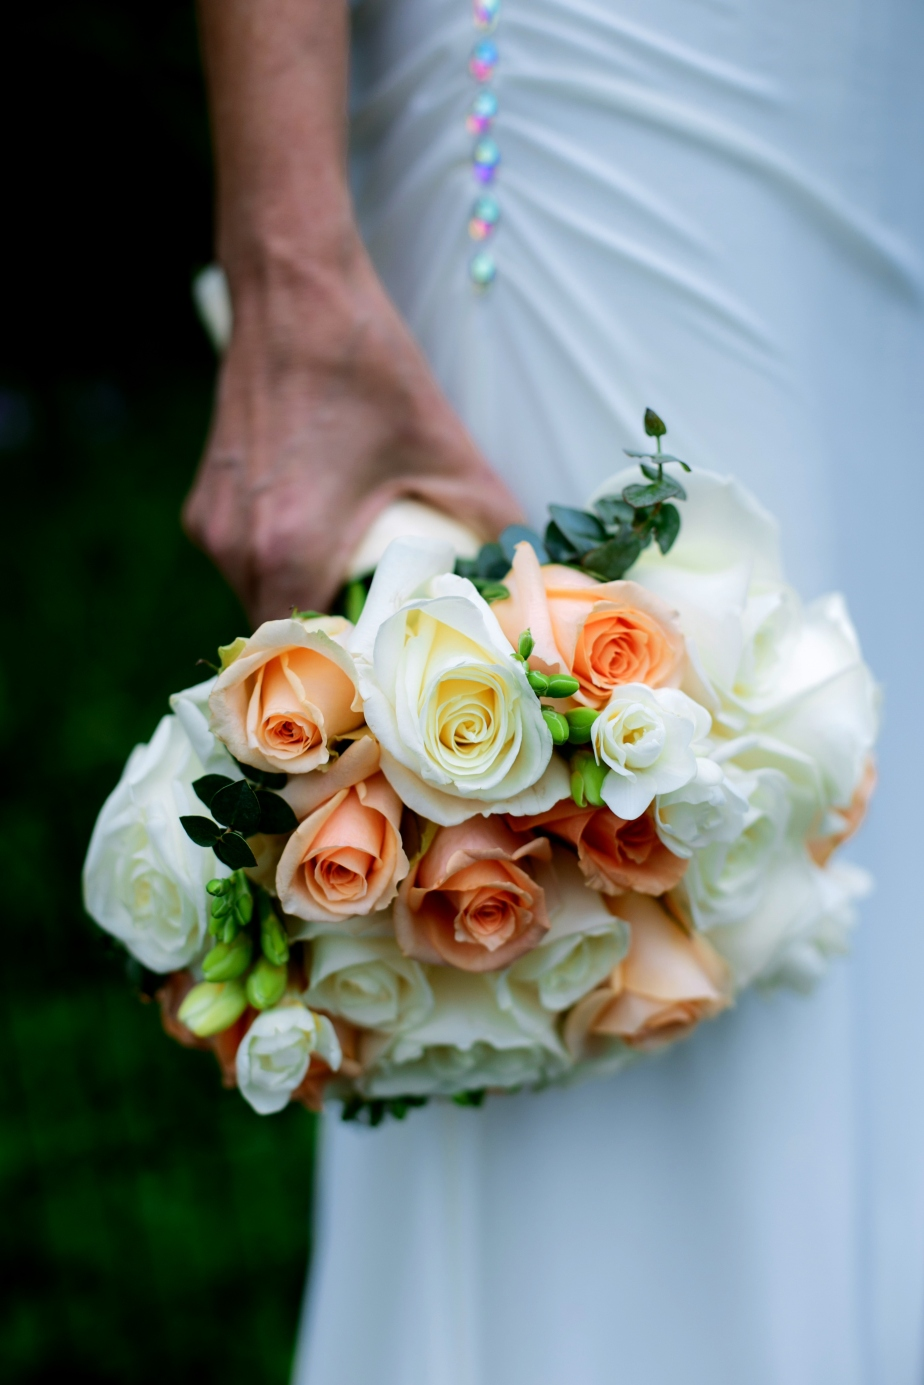 LadiesPavilion_centralpark_wedding_GS-196